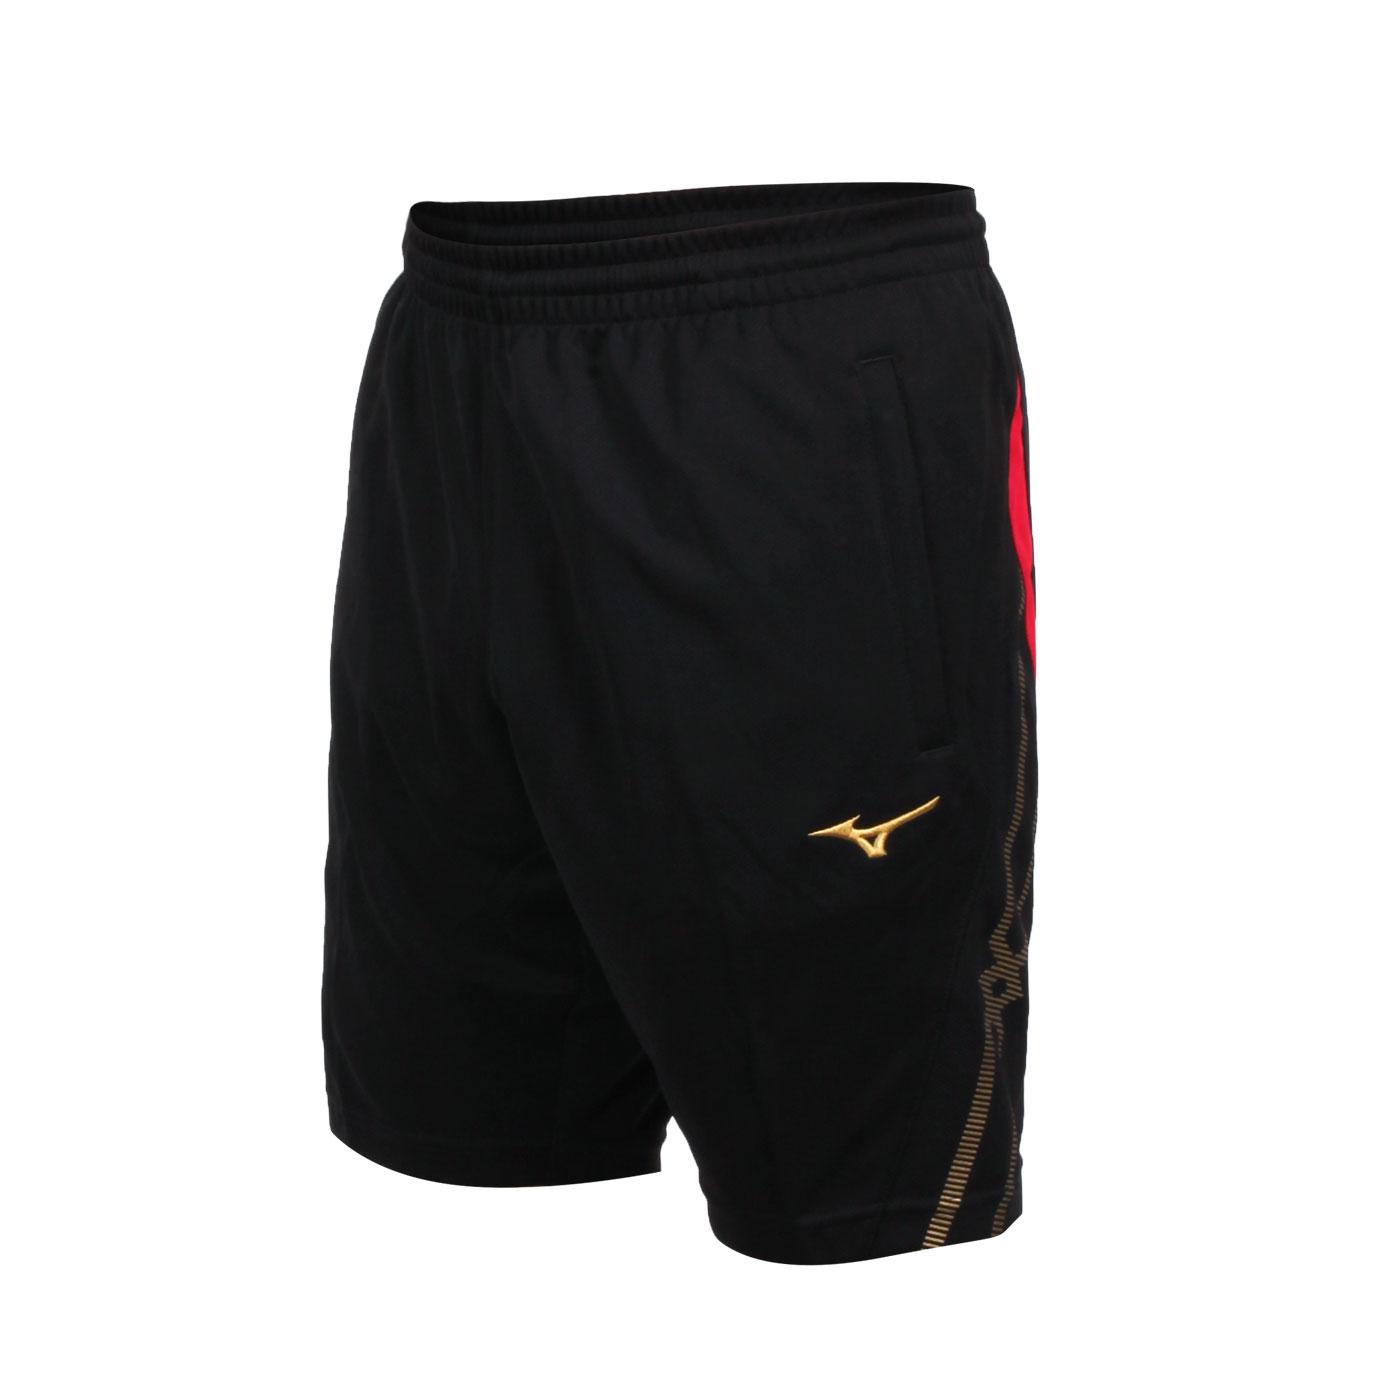 MIZUNO 男款針織運動短褲 32TB100496 - 黑紅金